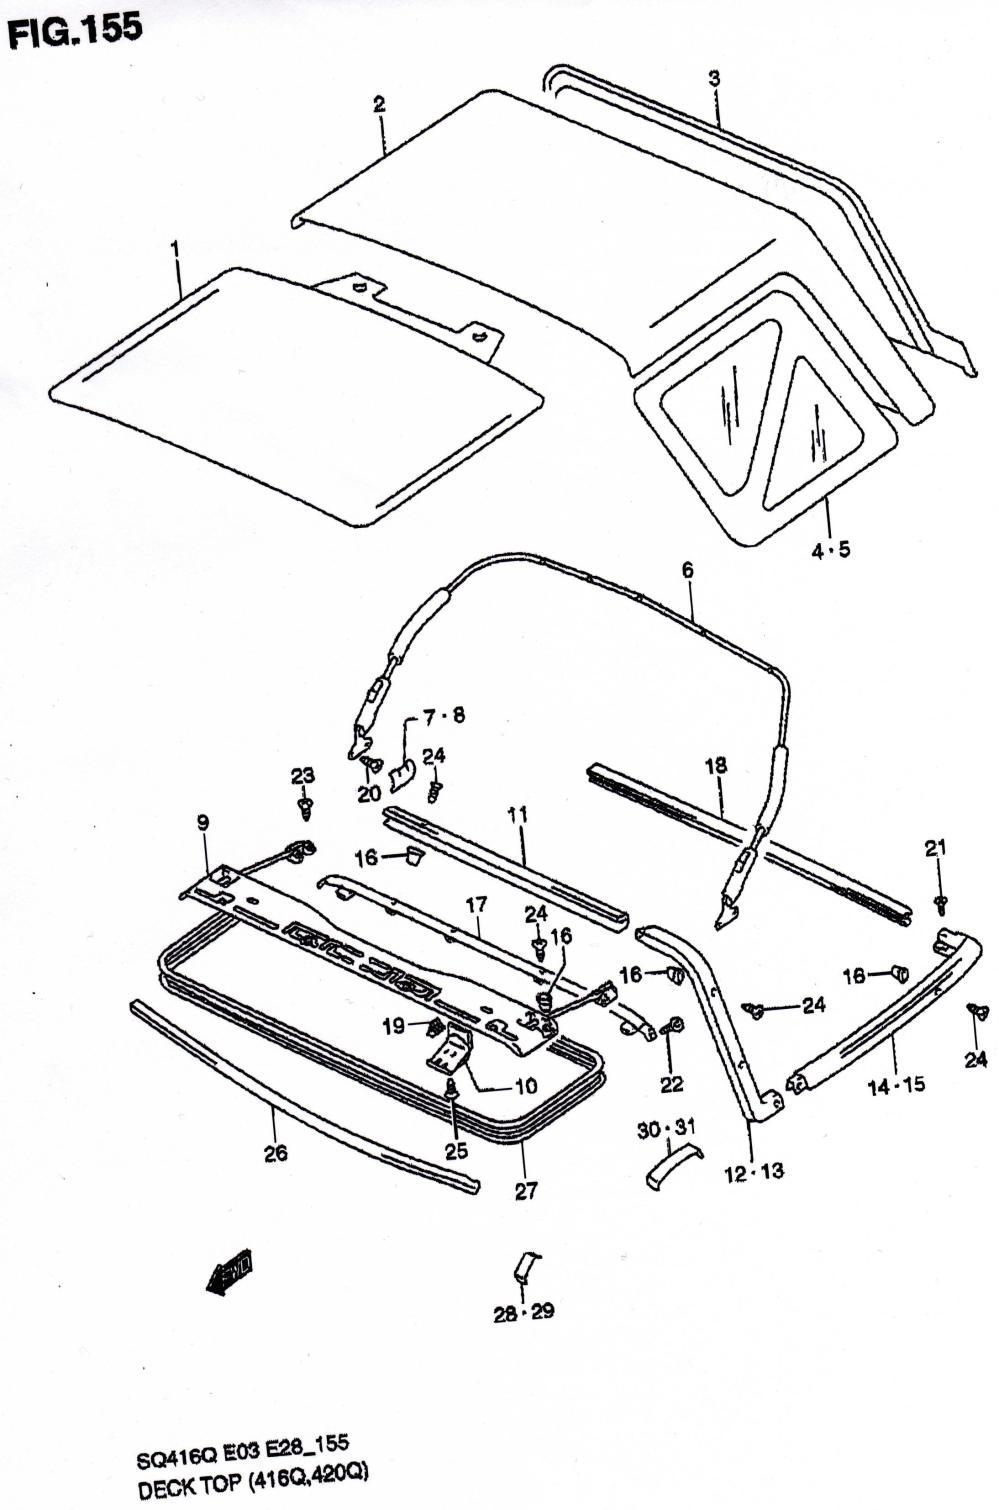 medium resolution of 2000 chevrolet prizm fuse box diagram imageresizertool com 2000 chevy tracker egr valve 2000 chevy tracker egr valve